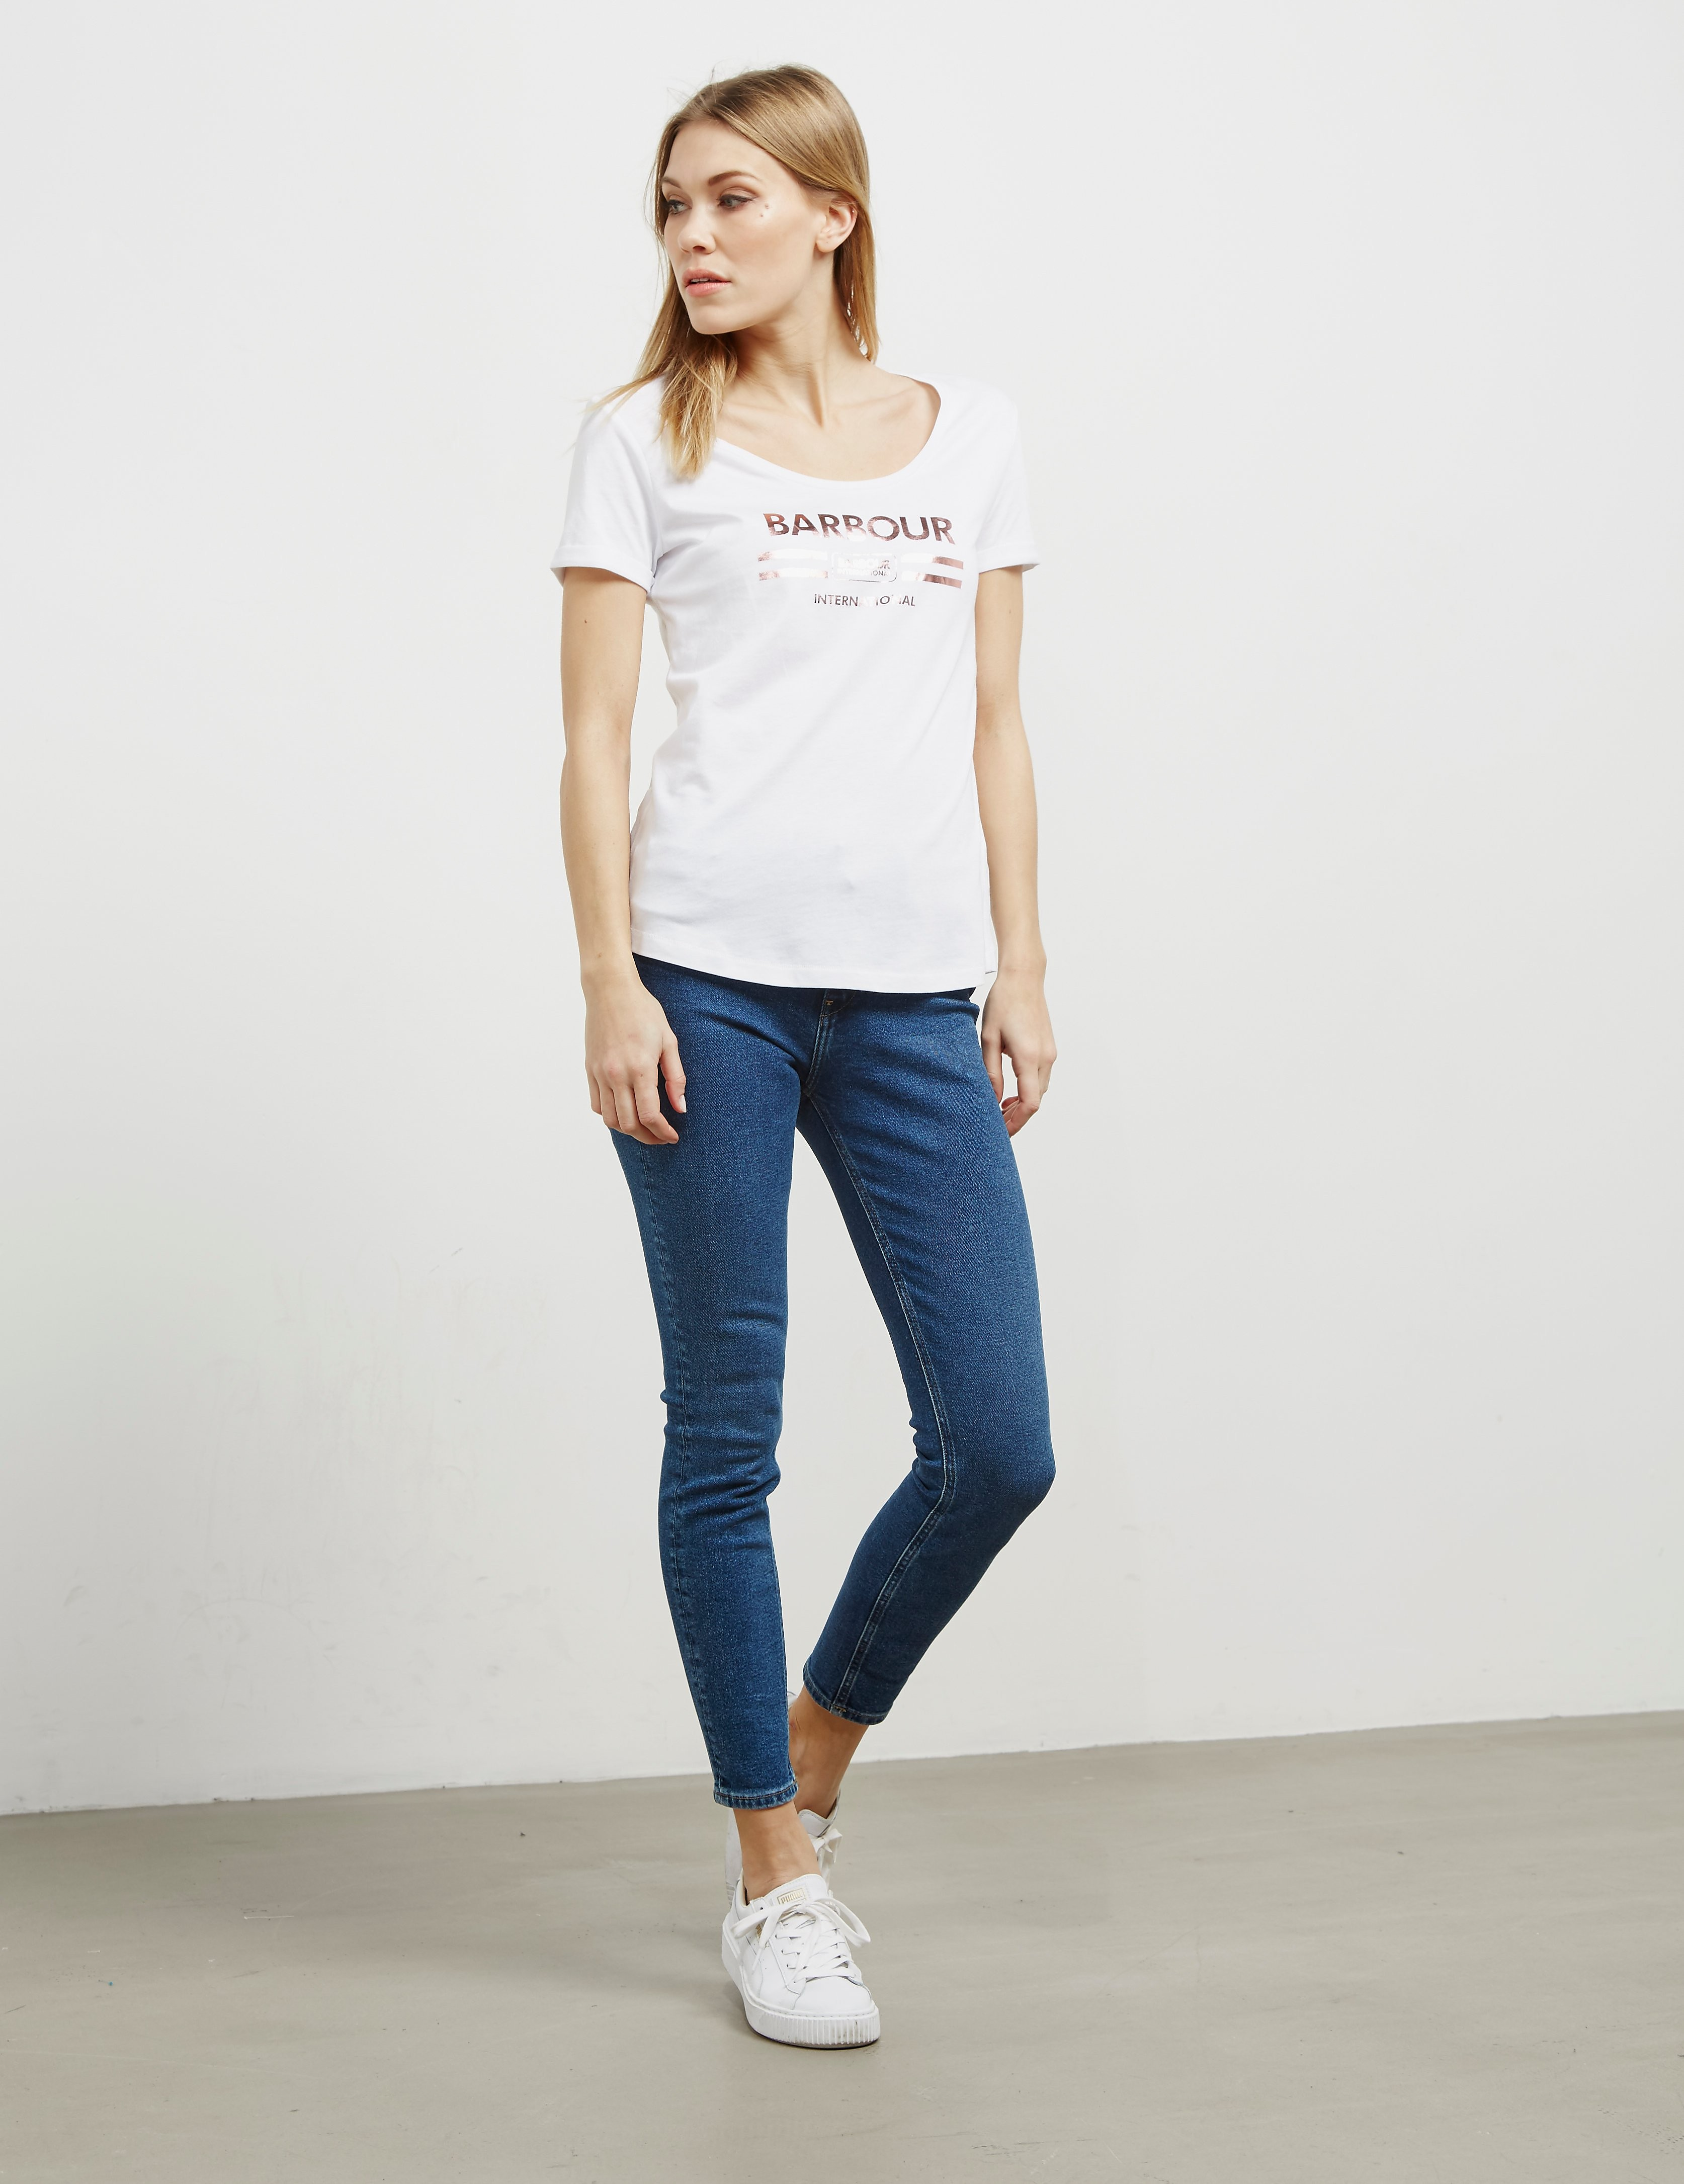 Barbour International Leader Short Sleeve T-Shirt